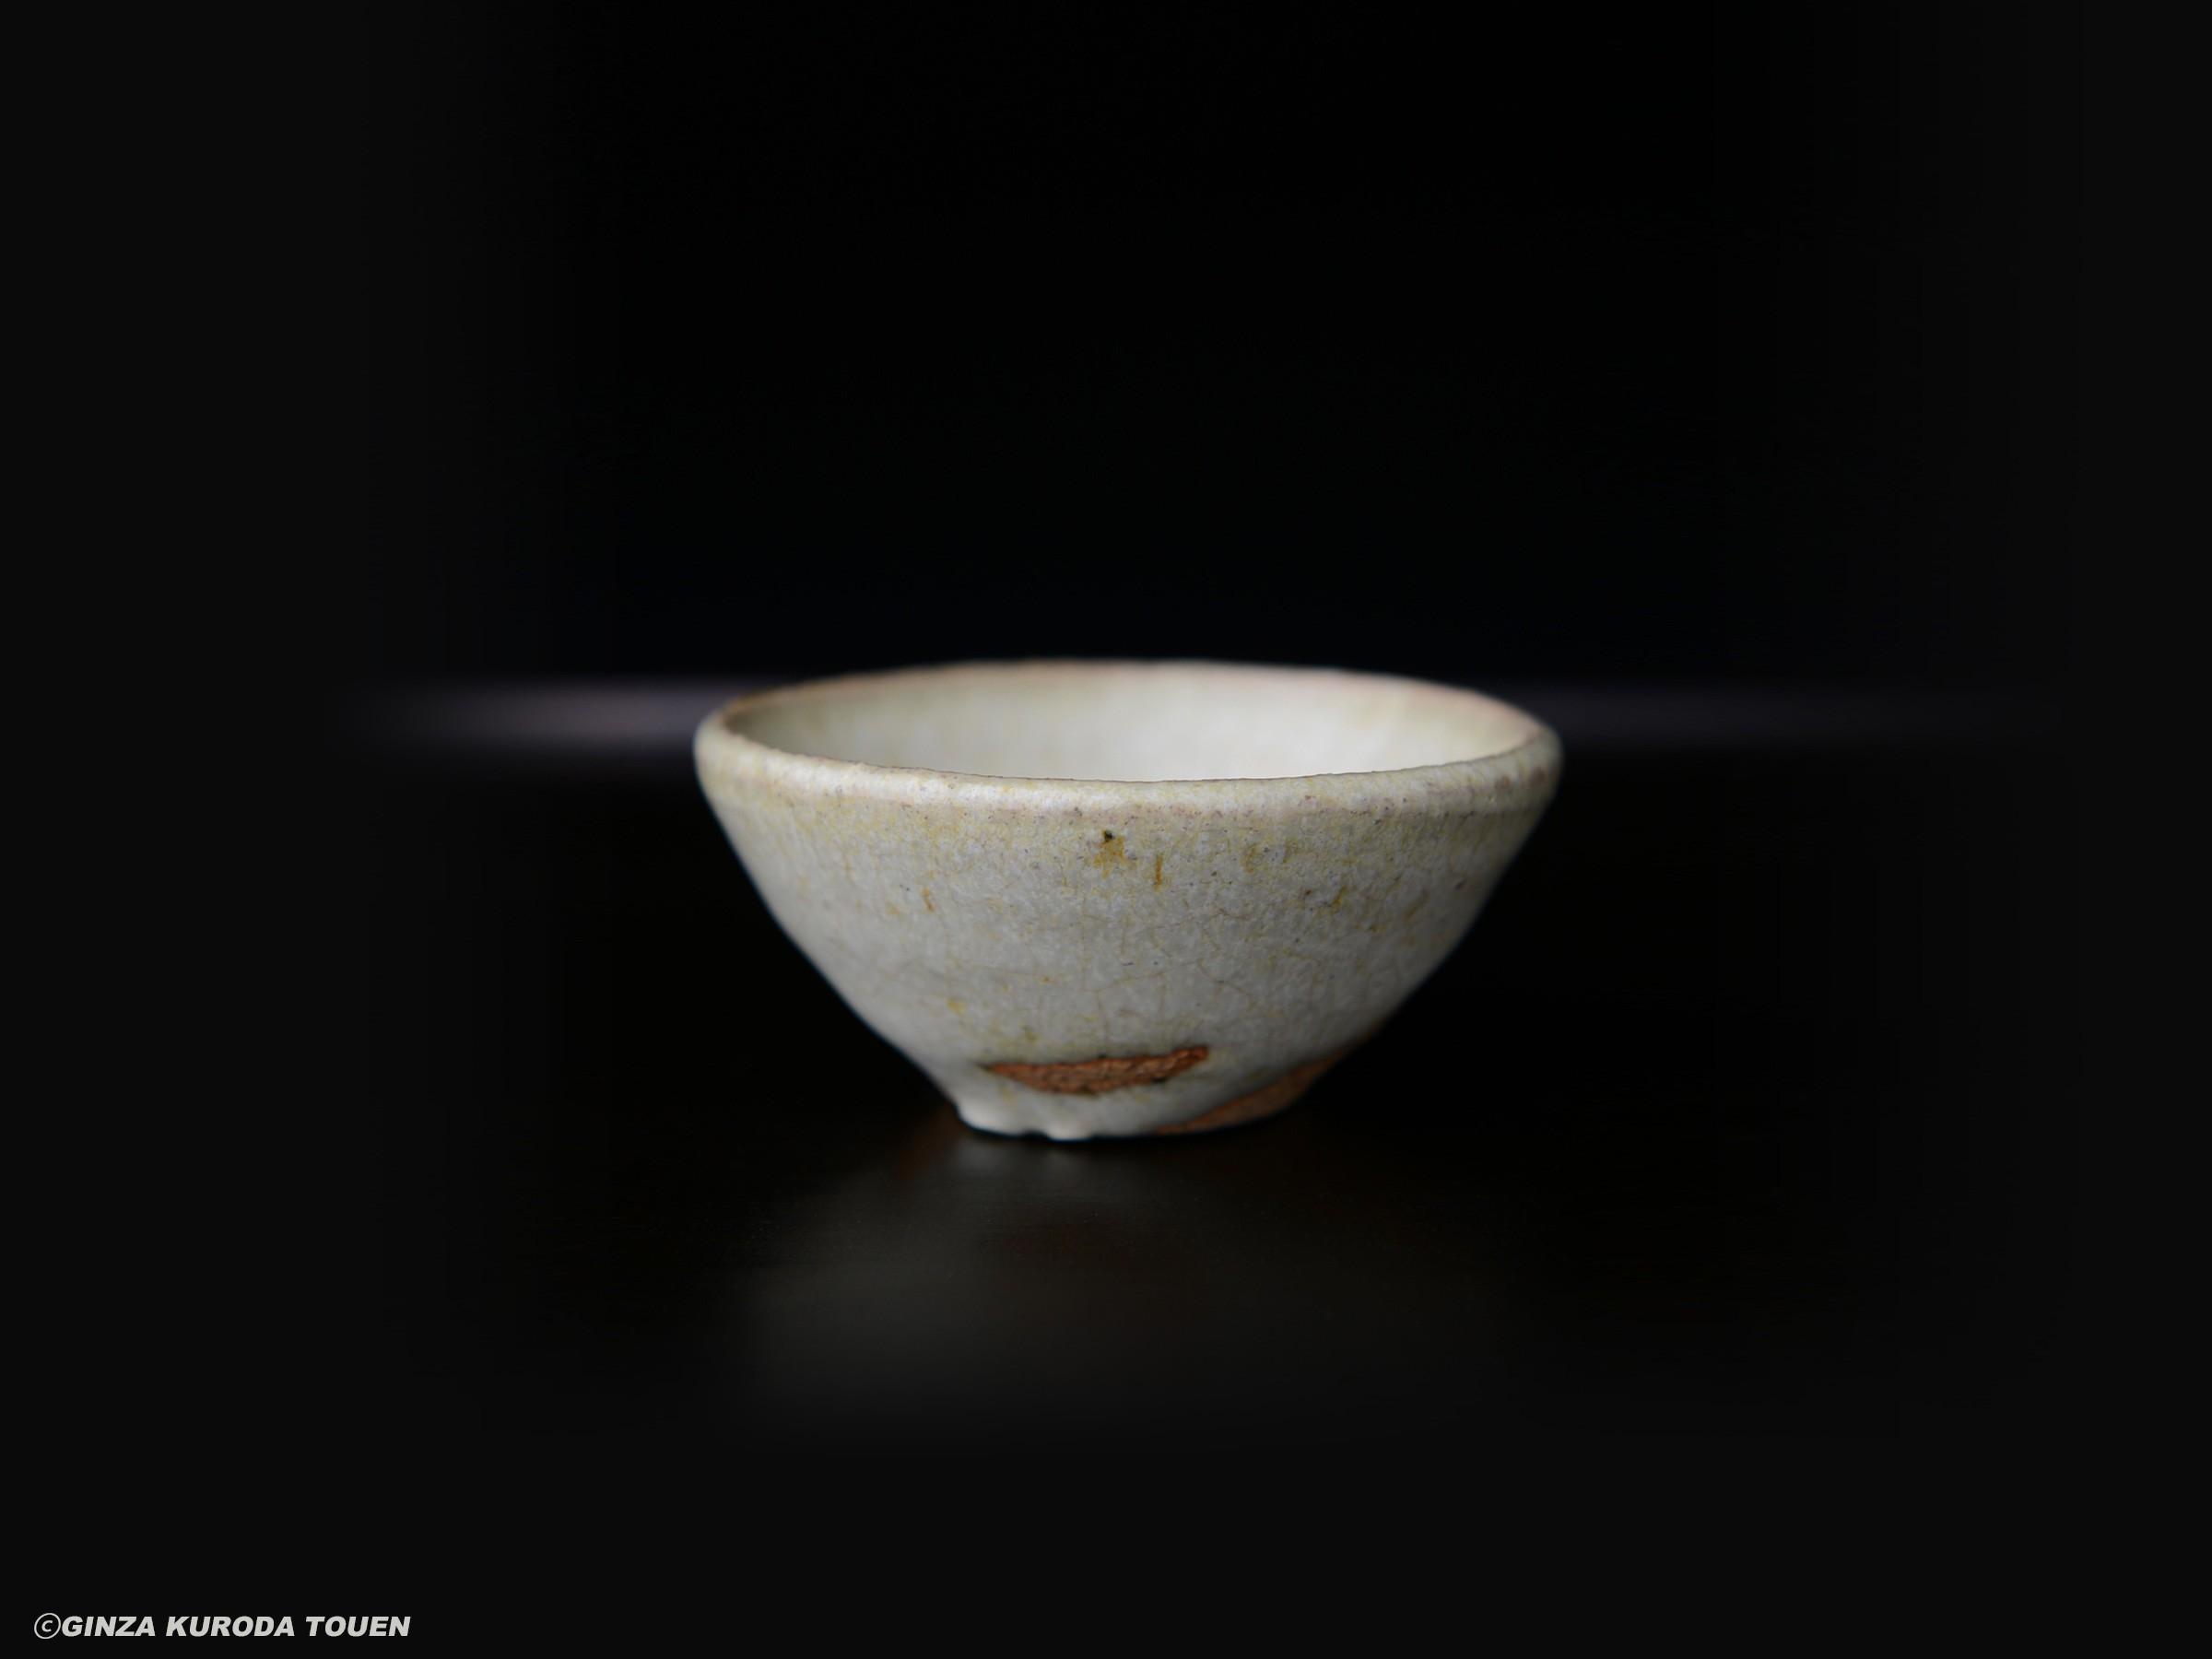 Munemaro Ishiguro: Sake cup, Opaque glaze